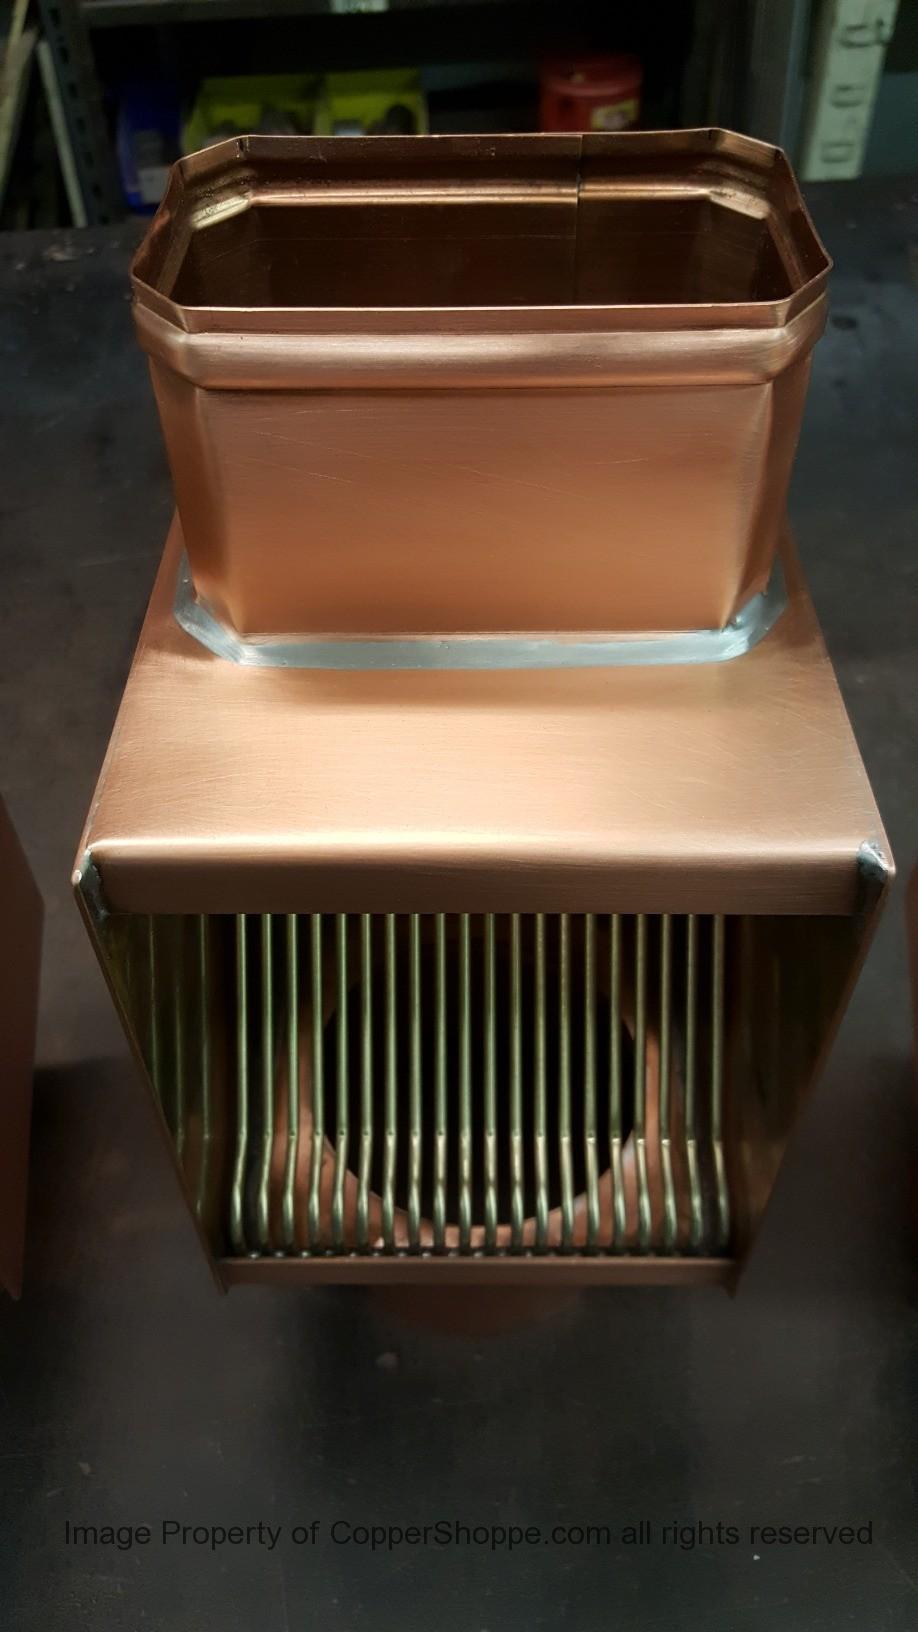 AutoClear Brasstonian Copper Downspout Leaf Debris Diverter Filter Cleanout for Rectangular Downspouts